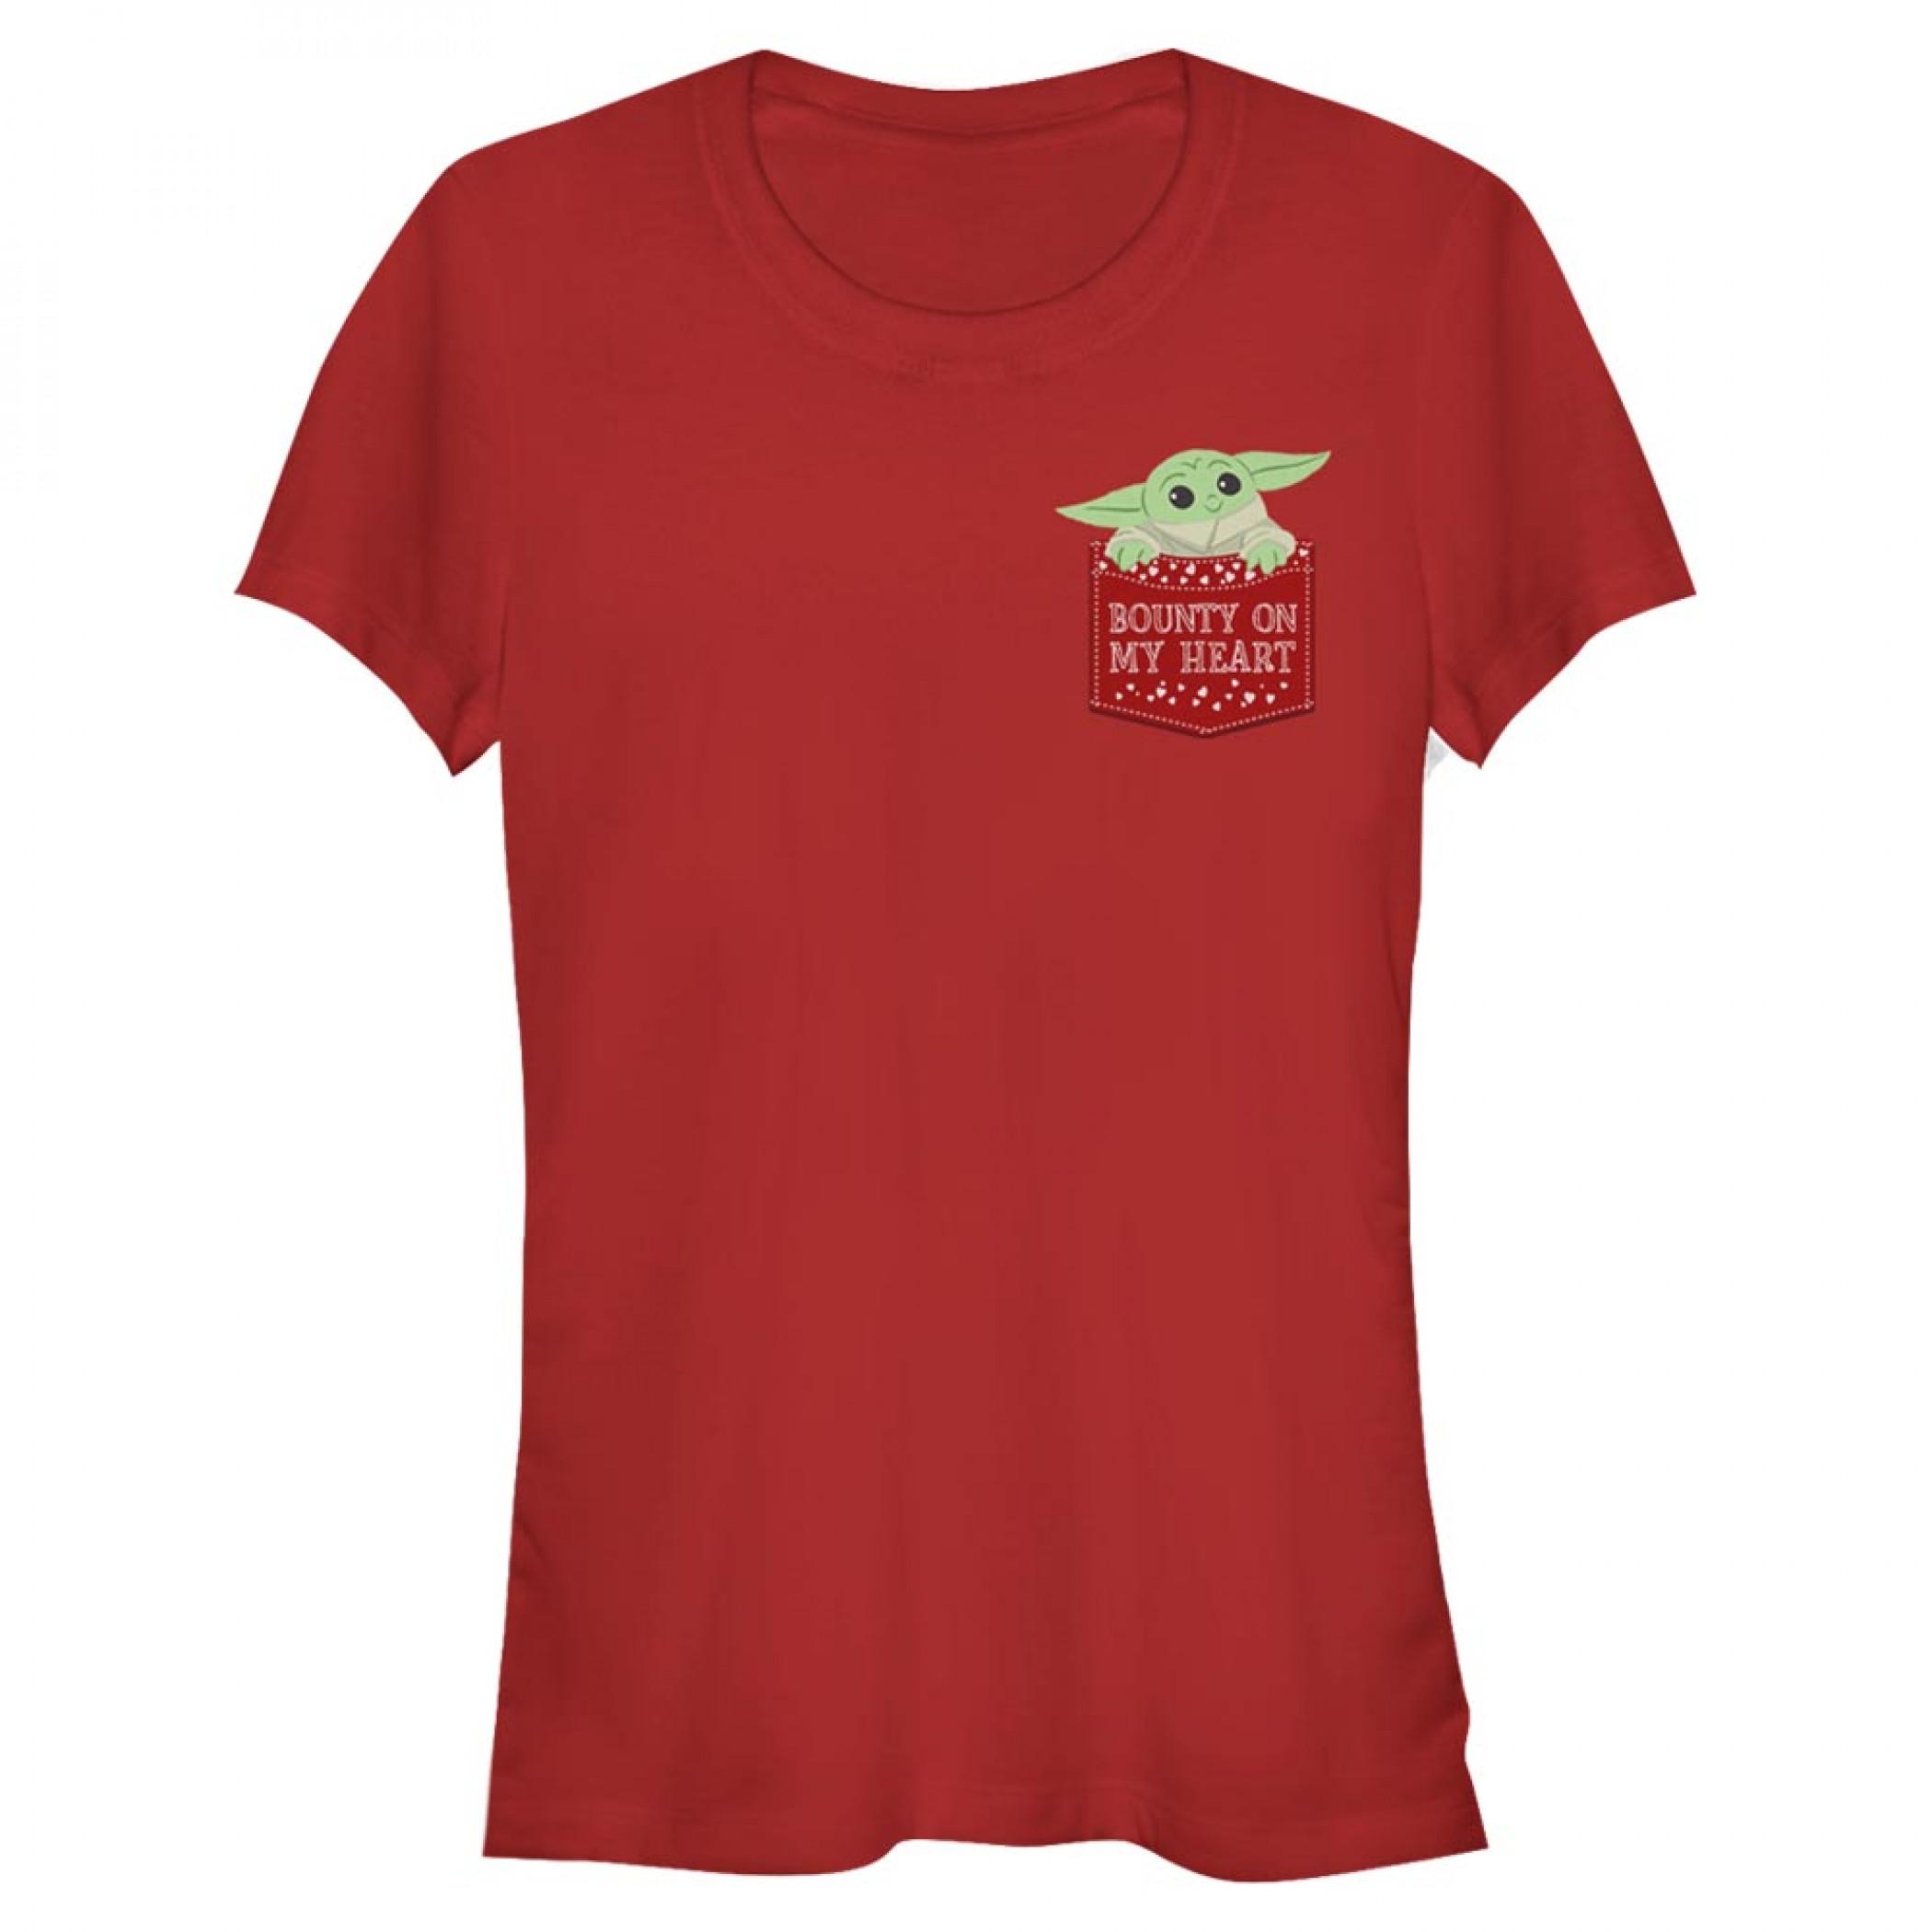 The Mandalorian Grogu Bounty On My Heart Women's T-Shirt